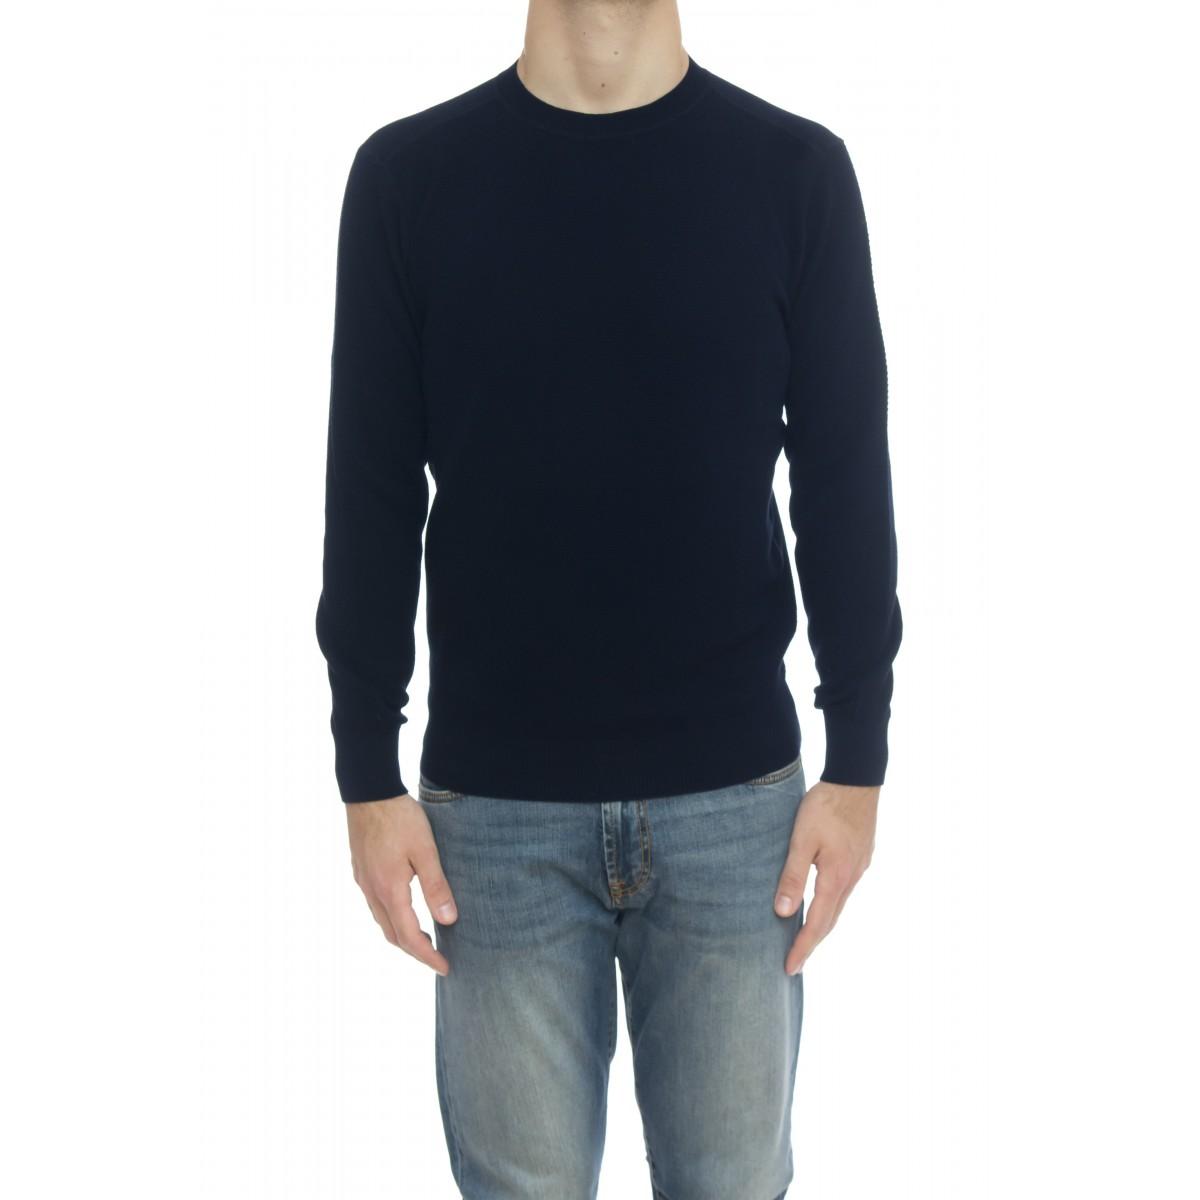 Giacca uomo - 9007/01 maglia giro punto felpa